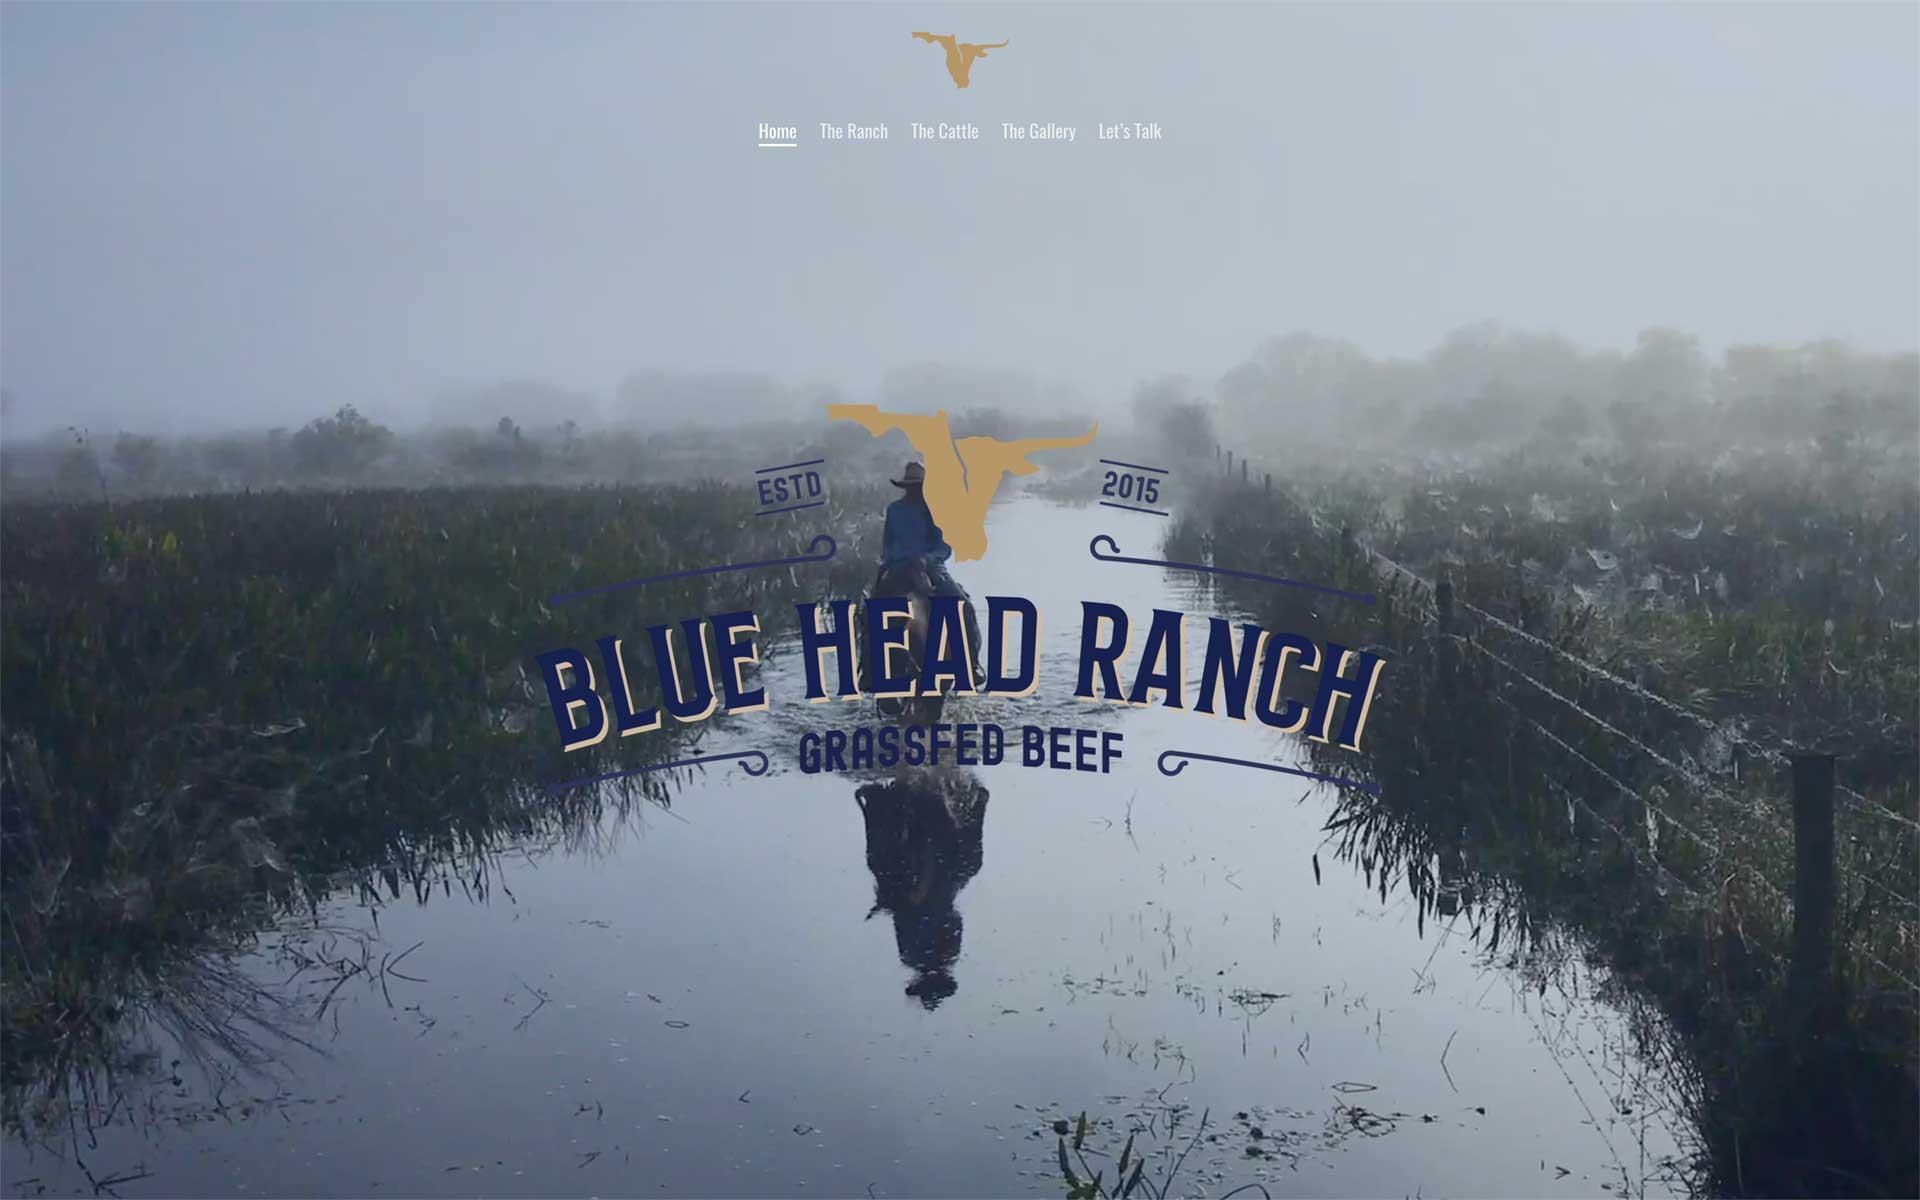 Blue Head Ranch Website